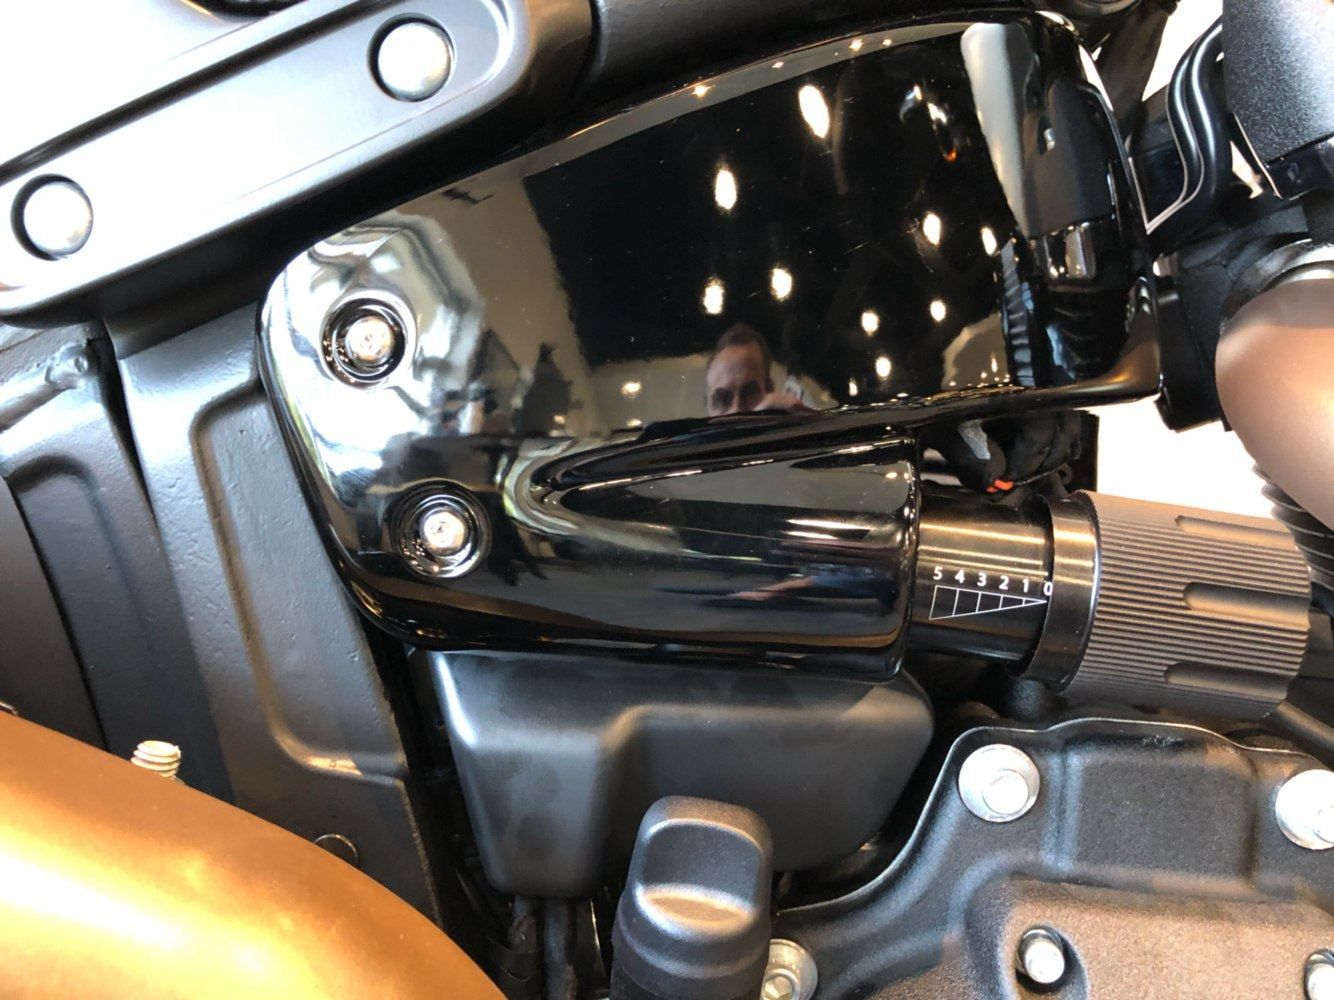 2019 Harley-Davidson Fat Bob® 114 in Portage, Michigan